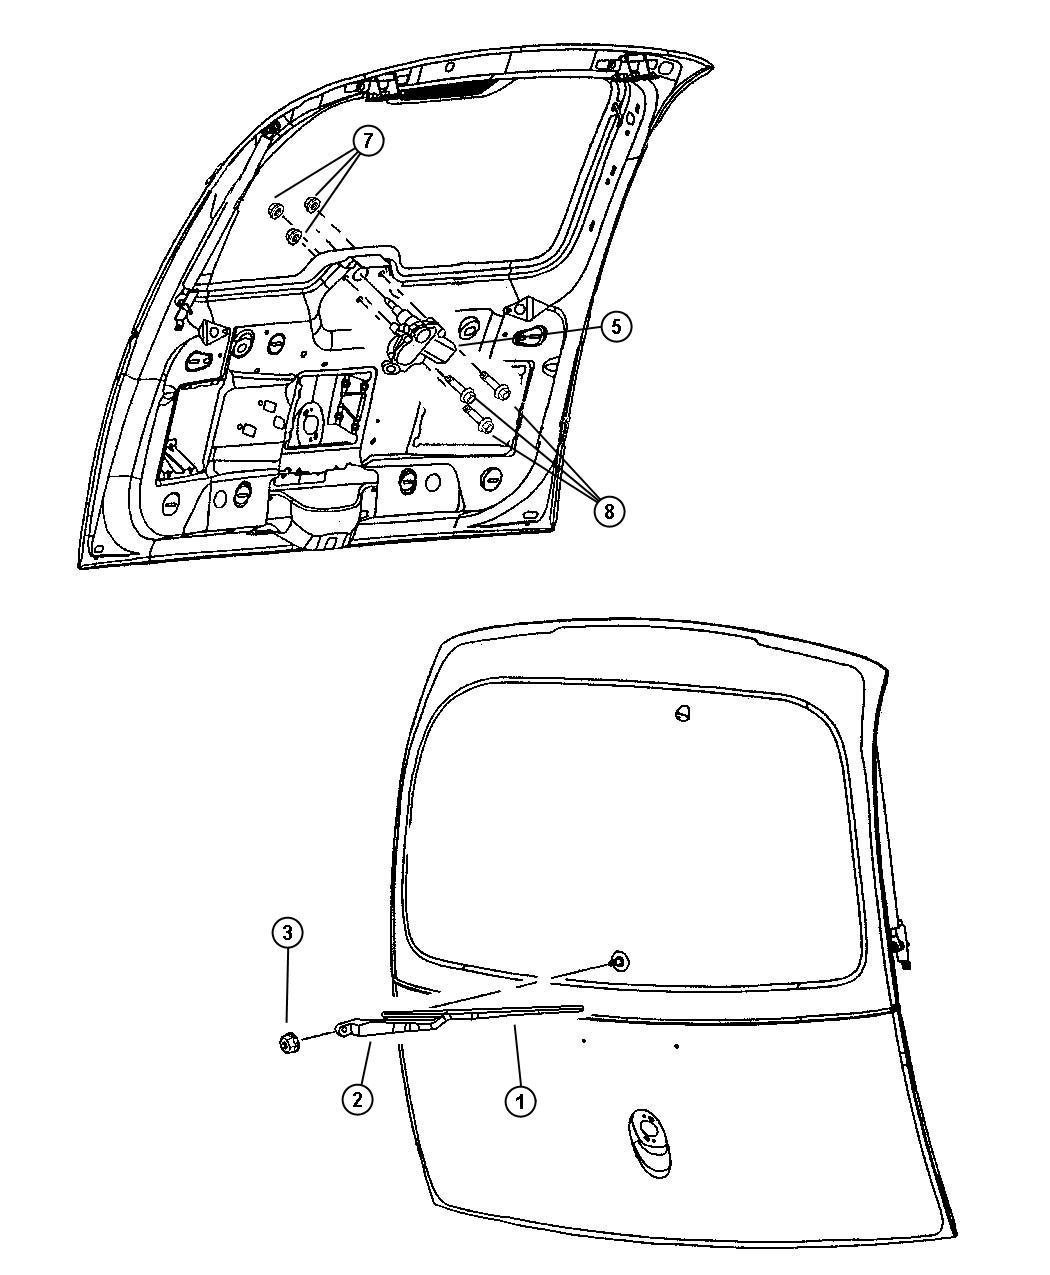 Dodge Caravan Wiper Diagram